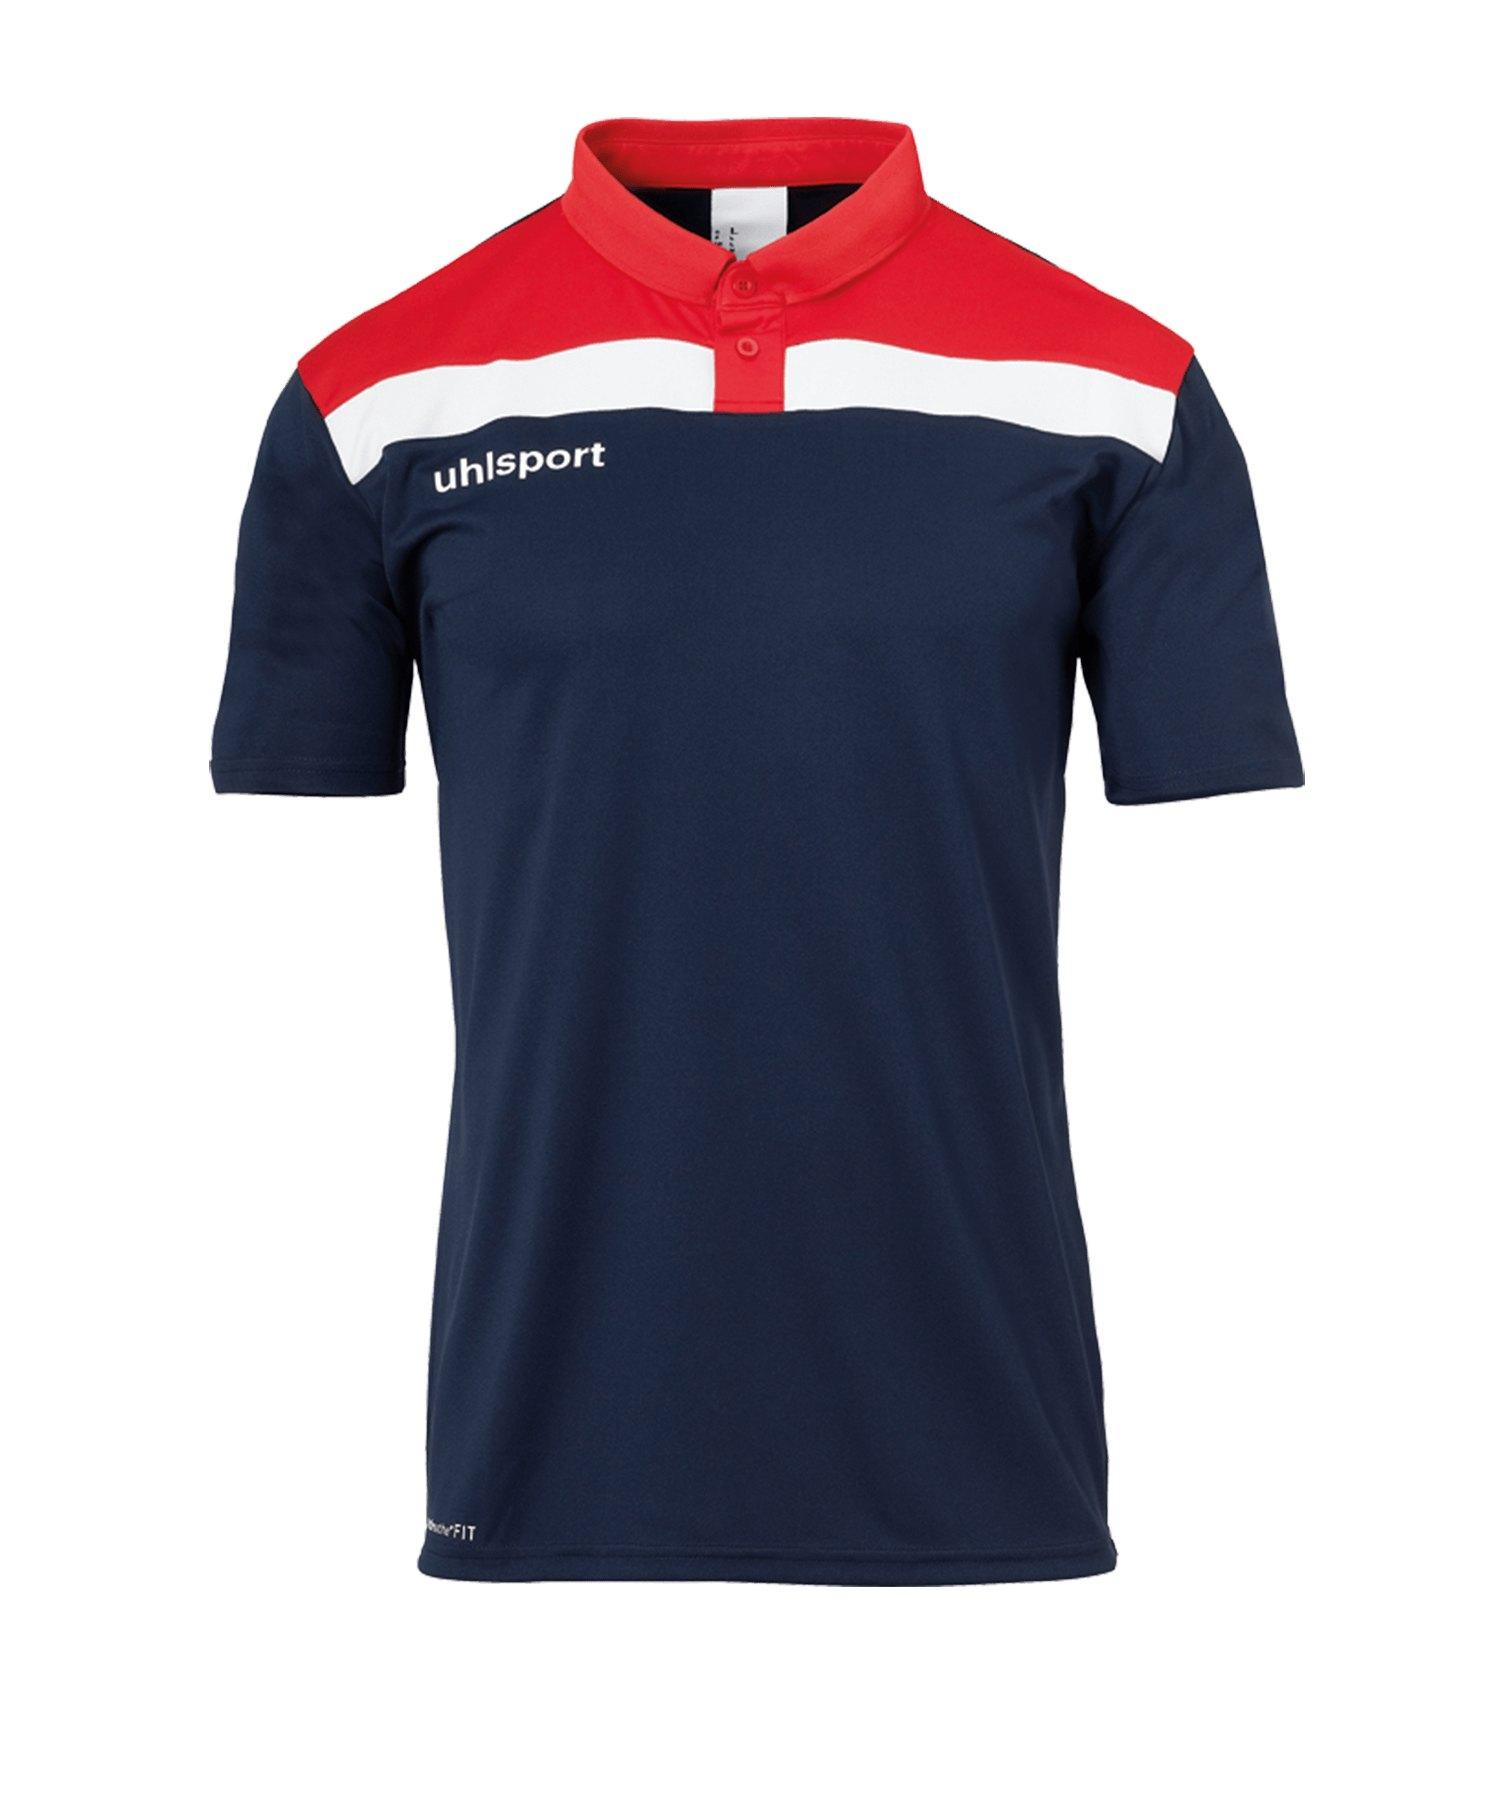 Uhlsport Offense 23 Poloshirt Kids Blau Rot F10 - blau